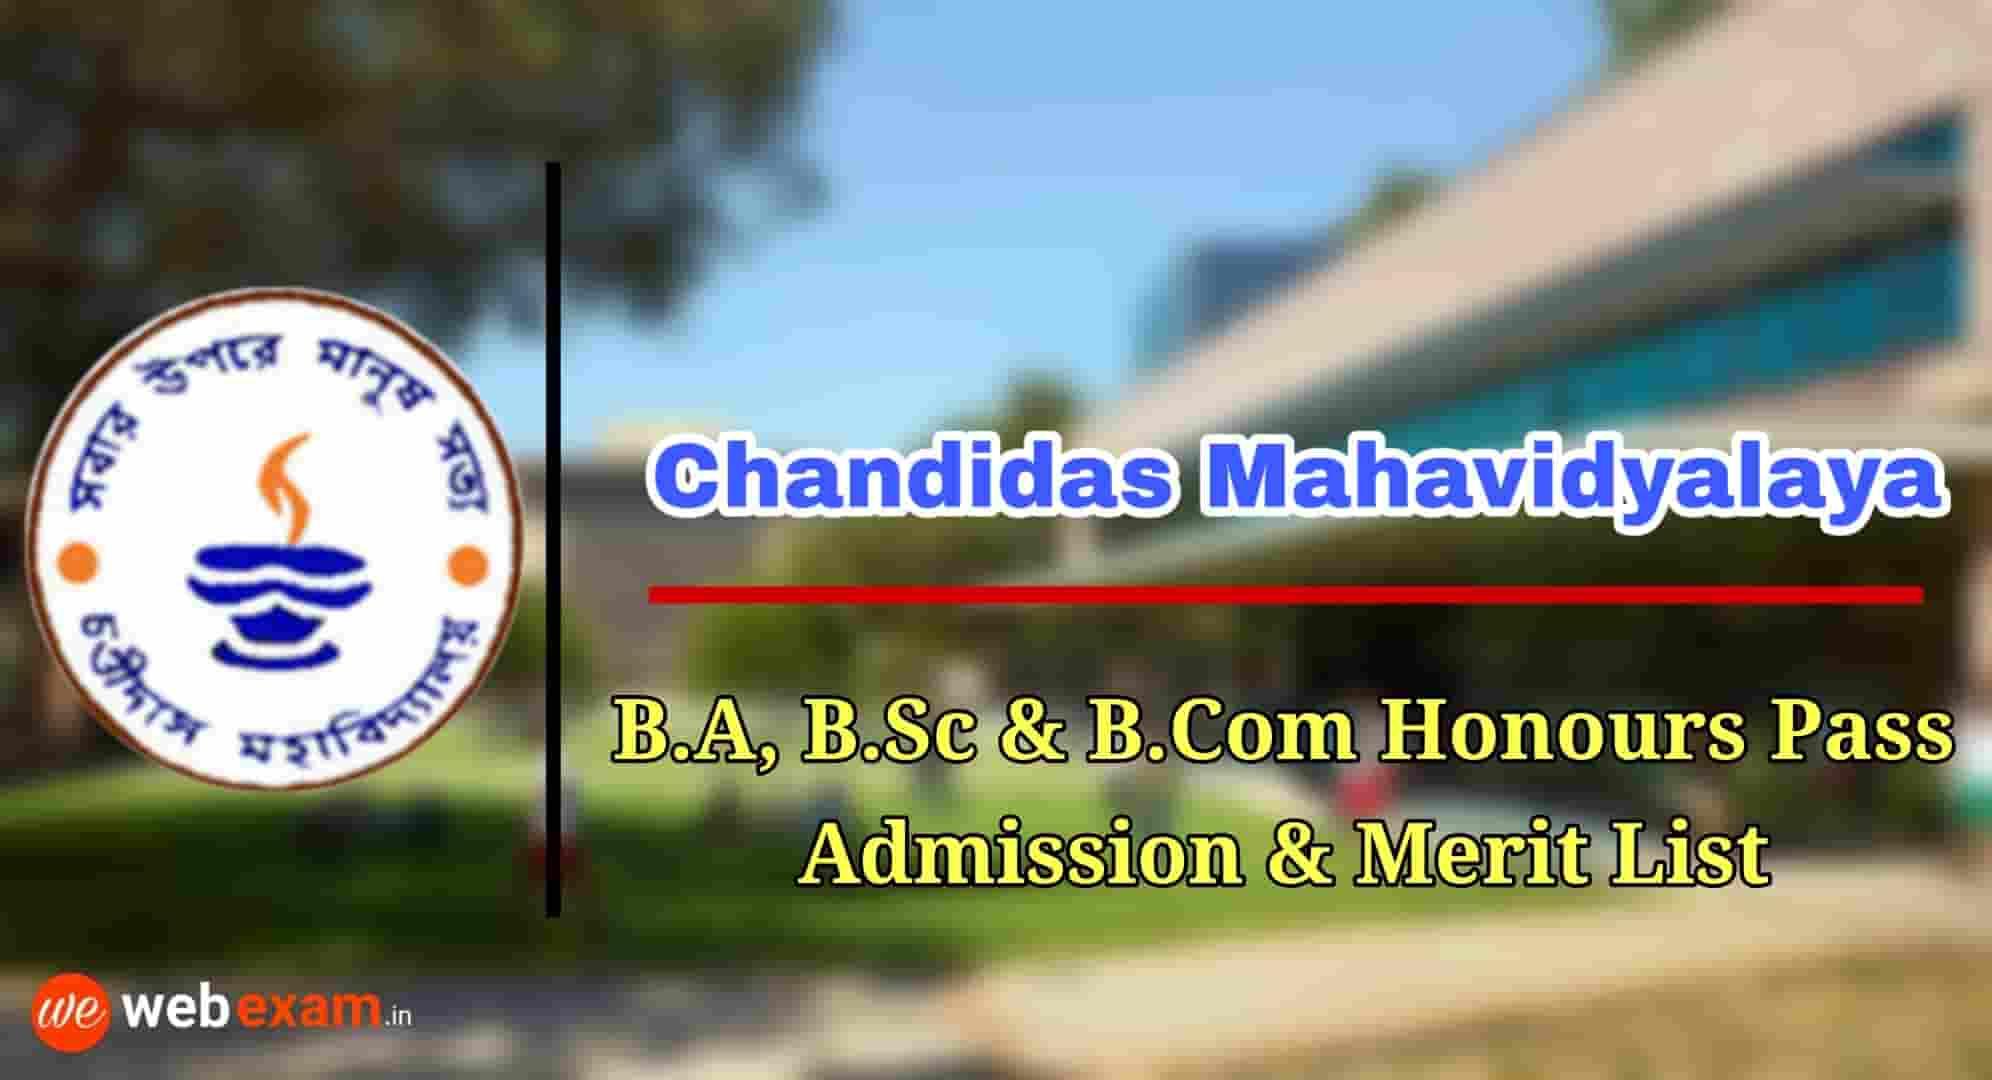 Chandidas Mahavidyalaya Admission